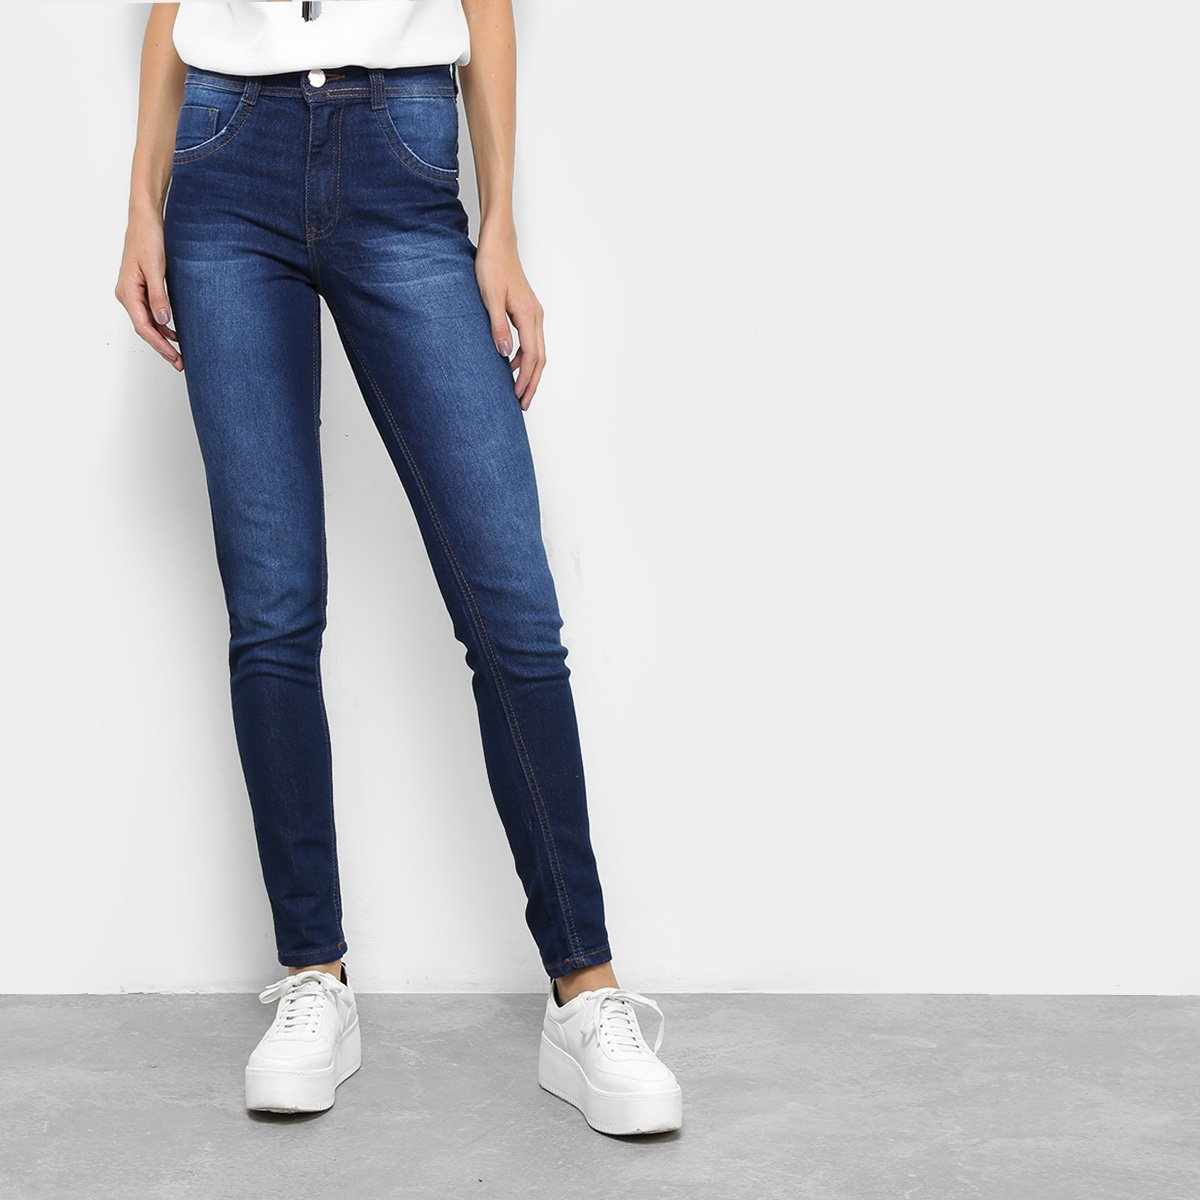 344fb6249 Calça Jeans Skinny Biotipo Melissa Soft Estonada Cintura Média Feminina